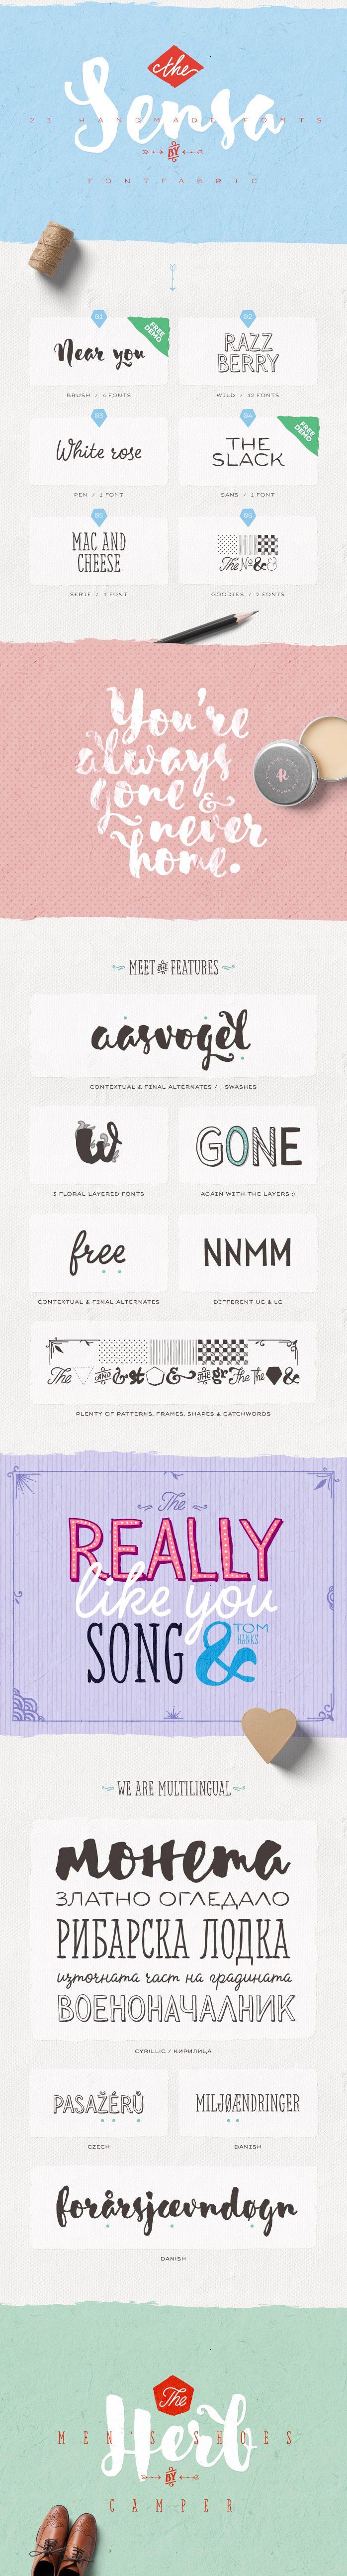 Sensa - Fontfabric